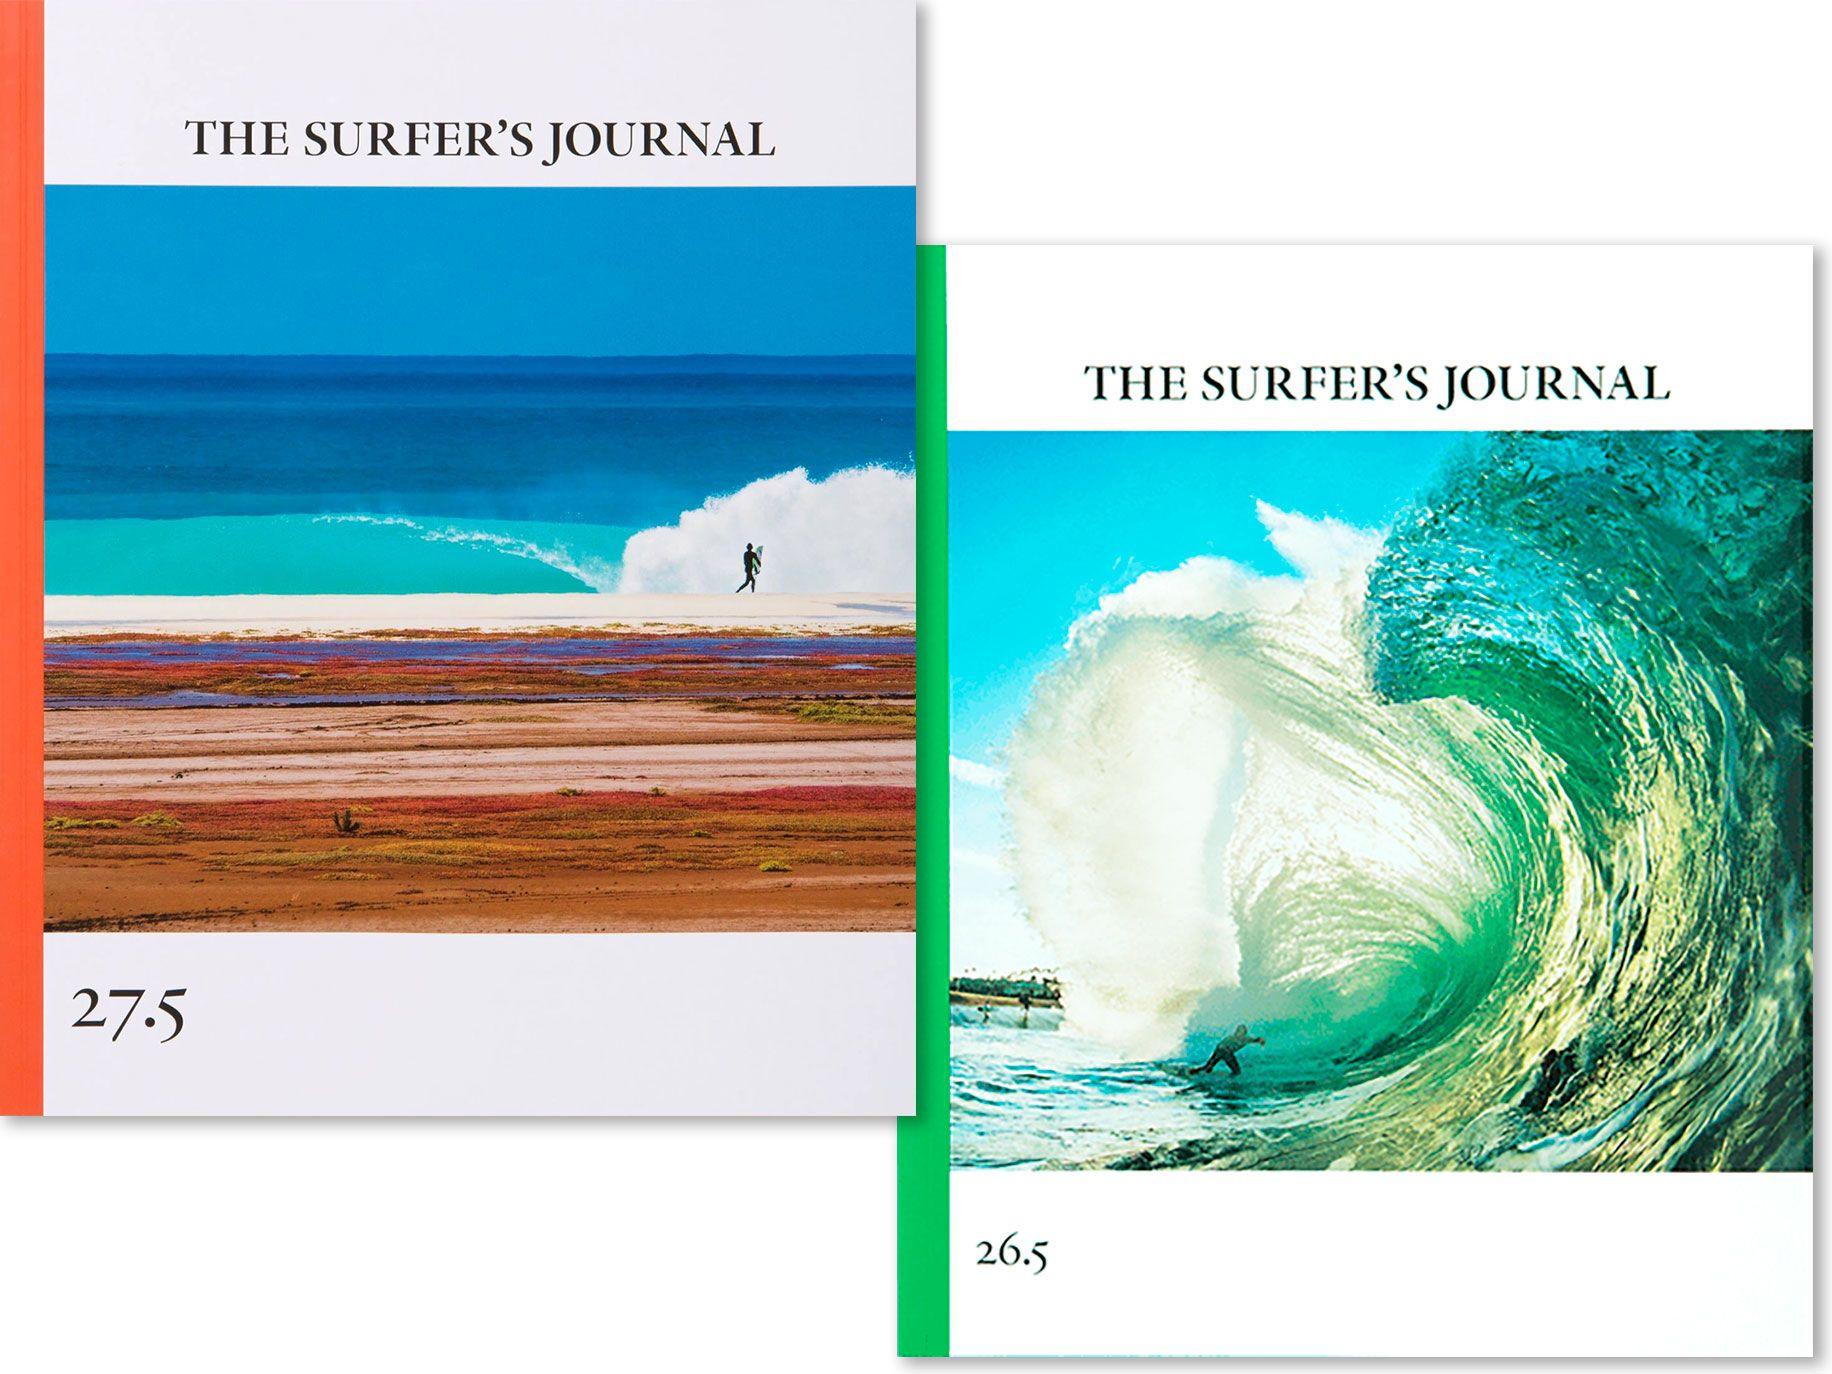 The Surfer's Journal magazine